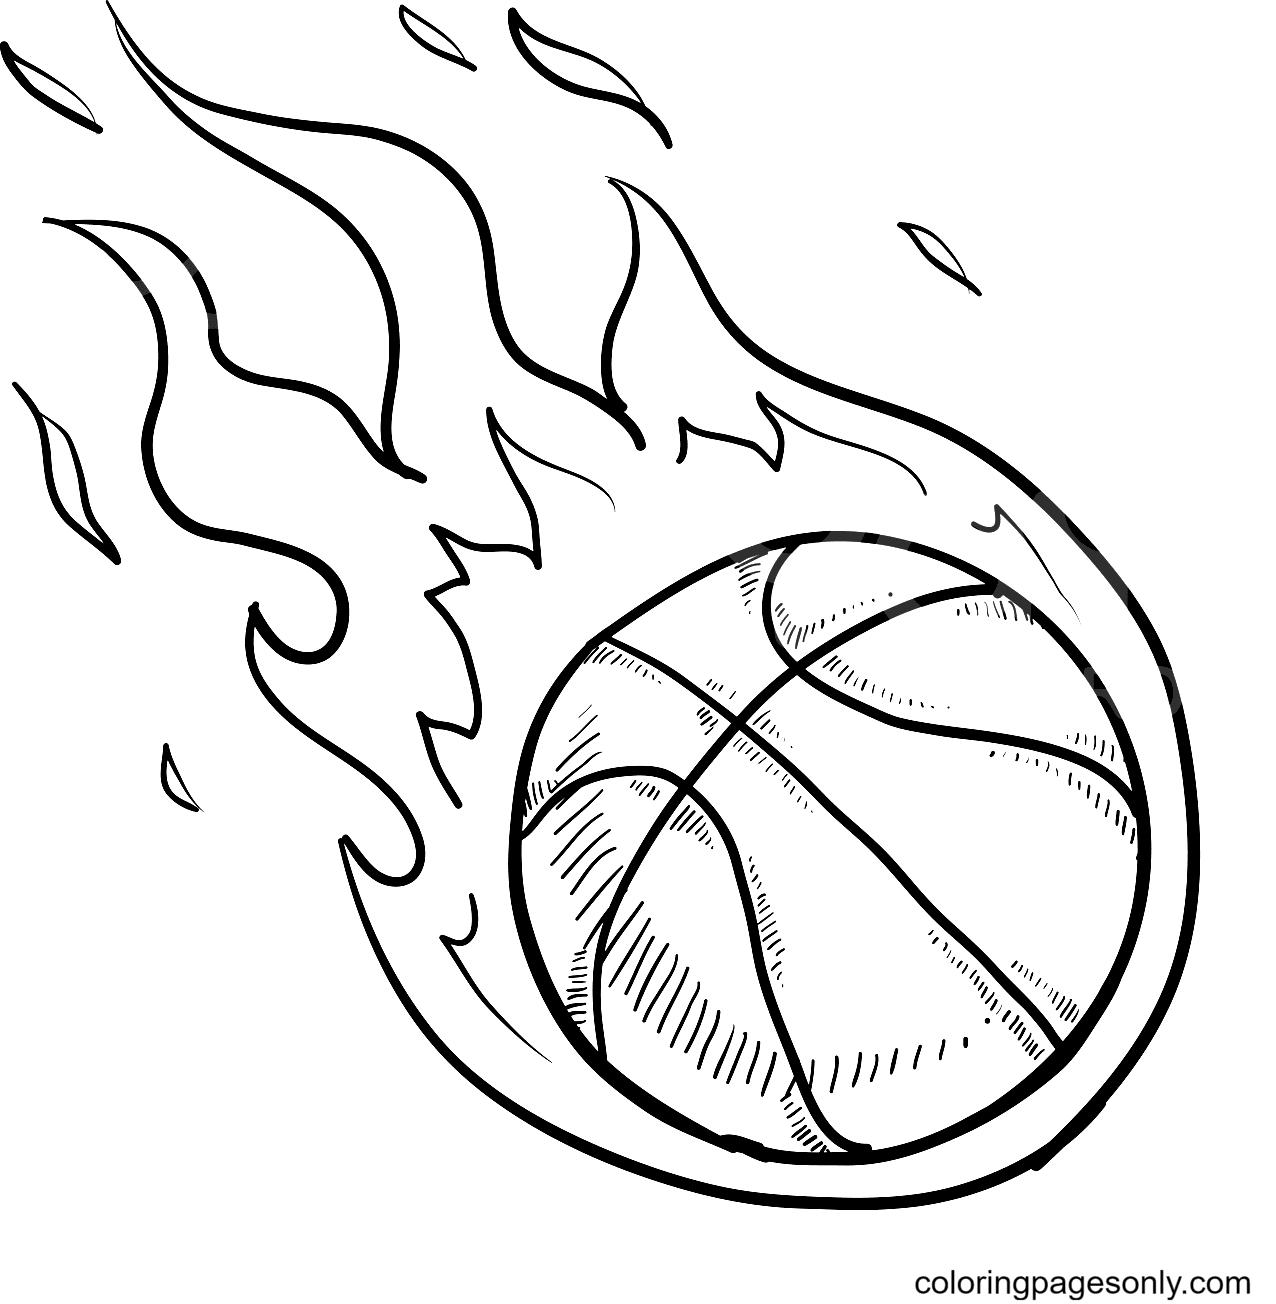 Flaming Basketball Coloring Page